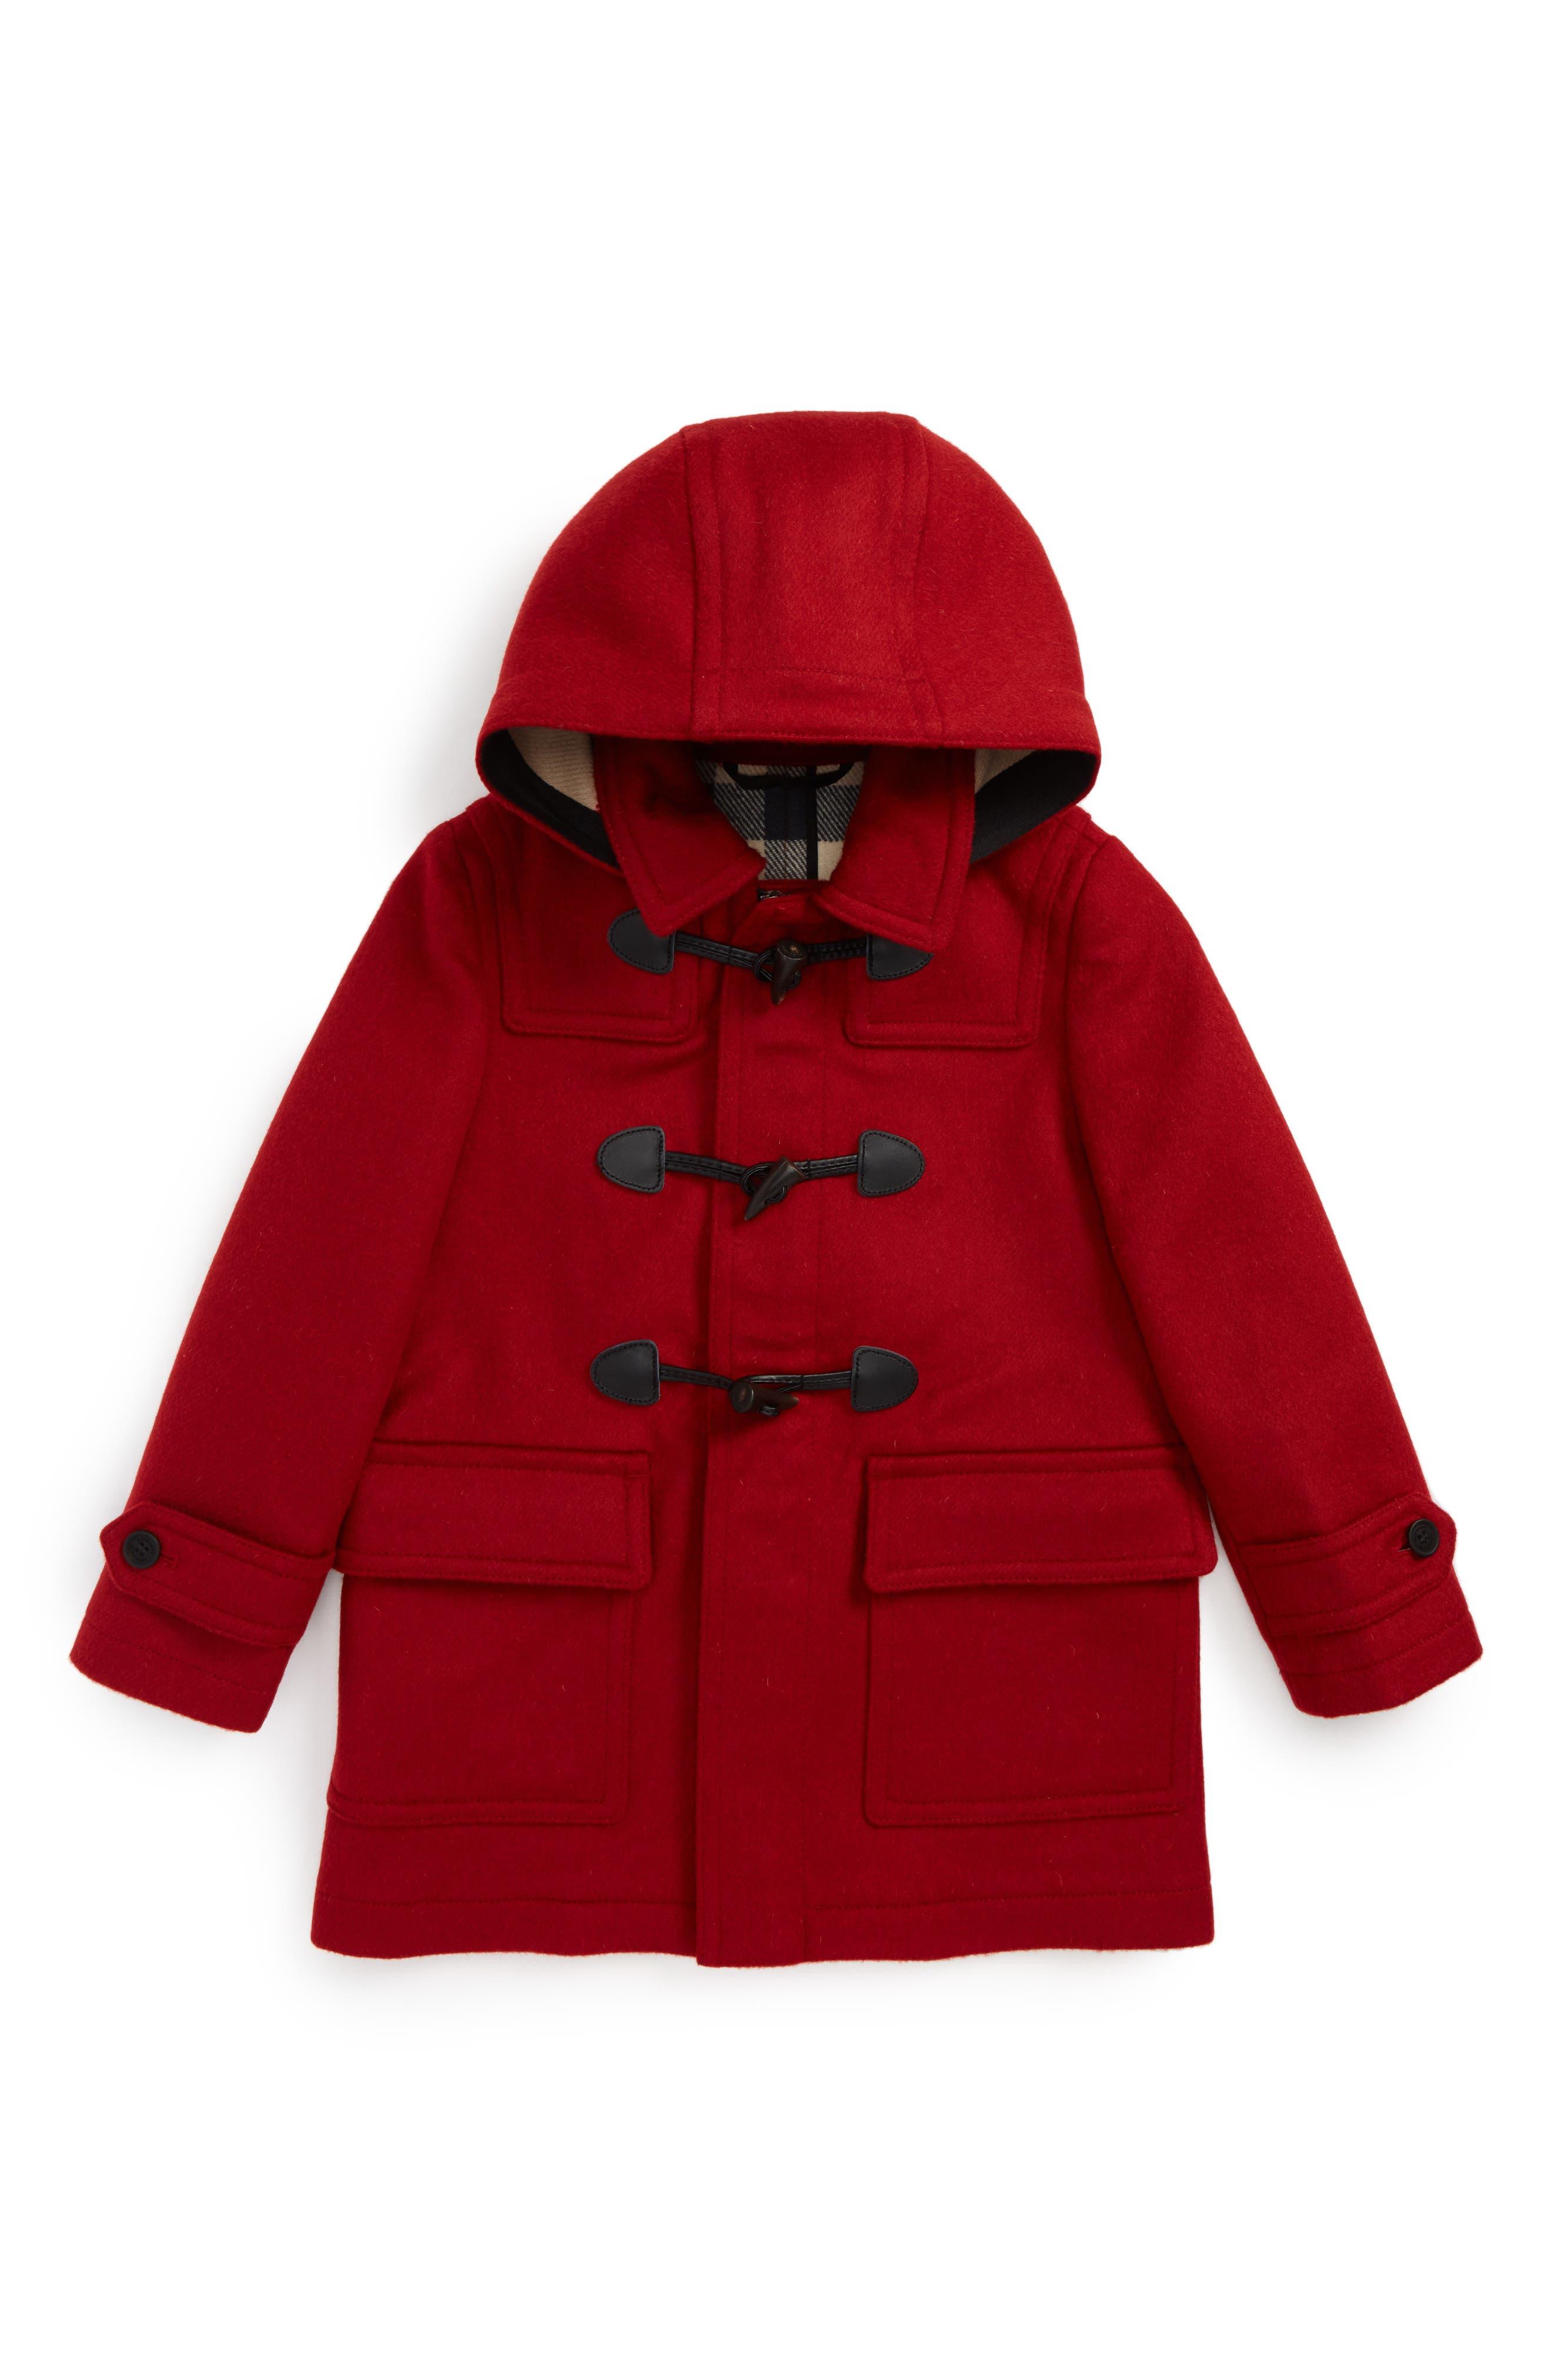 Main Image - Burberry Burwood Wool Toggle Coat (Little Boys & Big Boys)